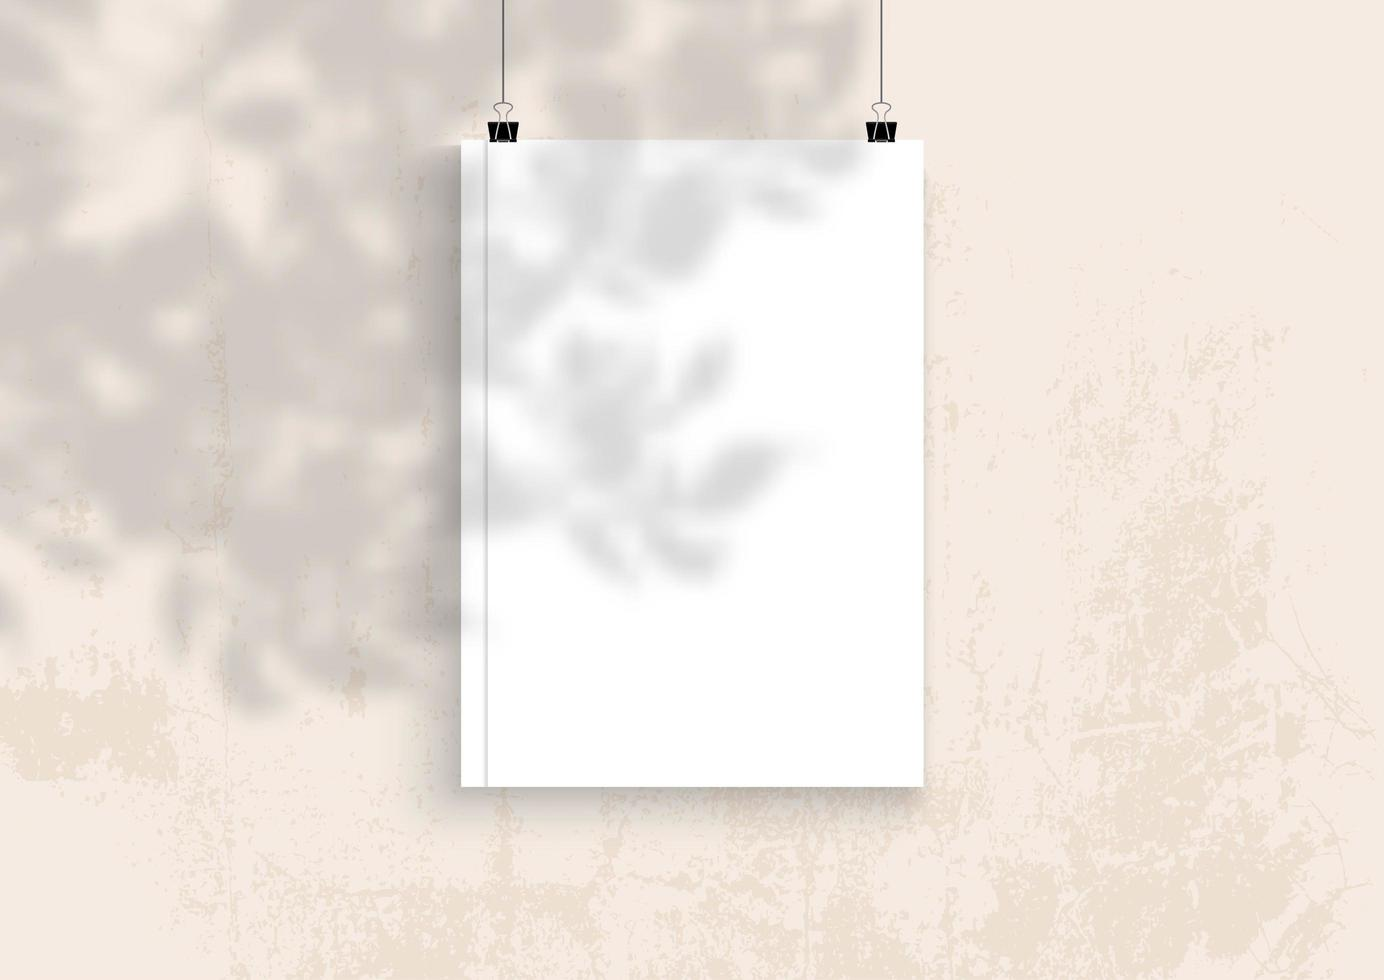 libro bianco mock up vettore